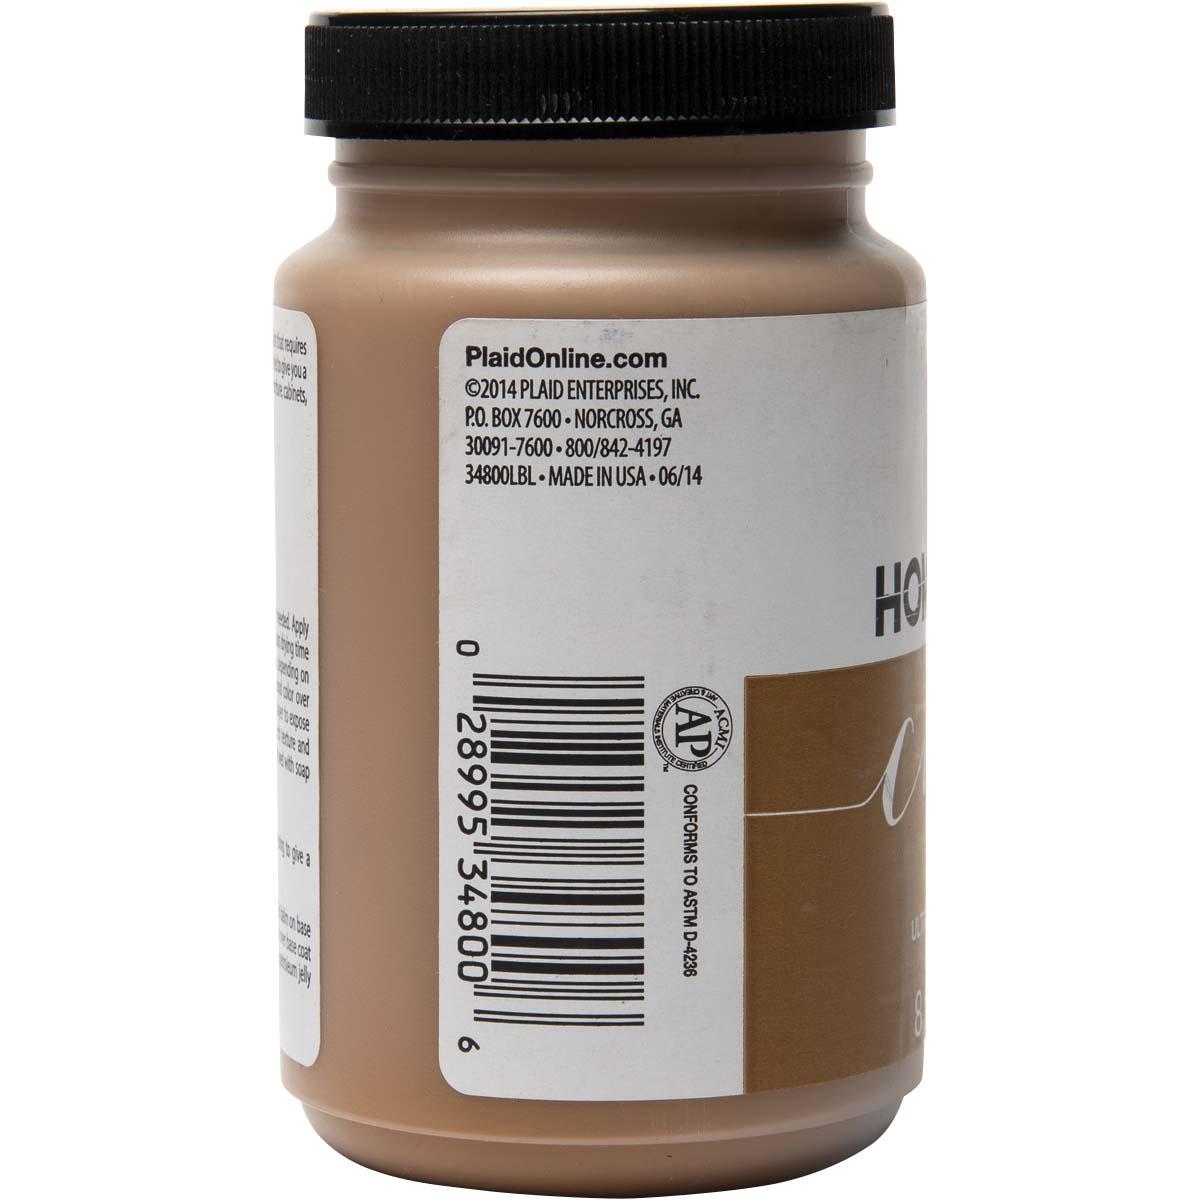 FolkArt ® Home Decor™ Chalk - Cinnamon, 8 oz. - 34800